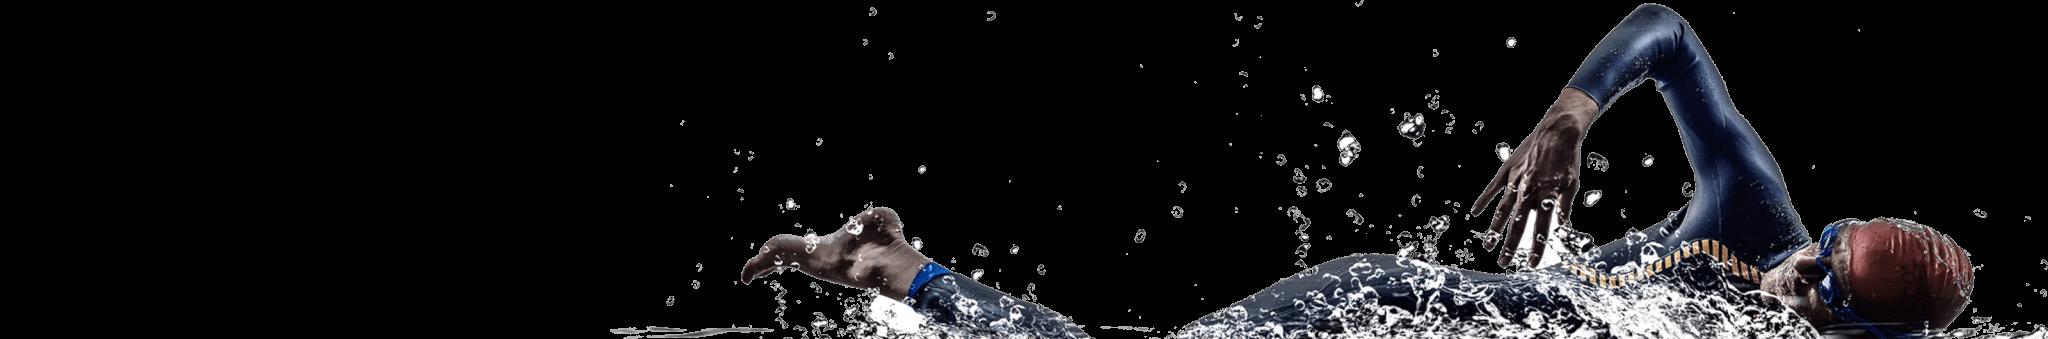 https://www.psb.org.rs/wp-content/uploads/2017/10/inner_swimmer.png